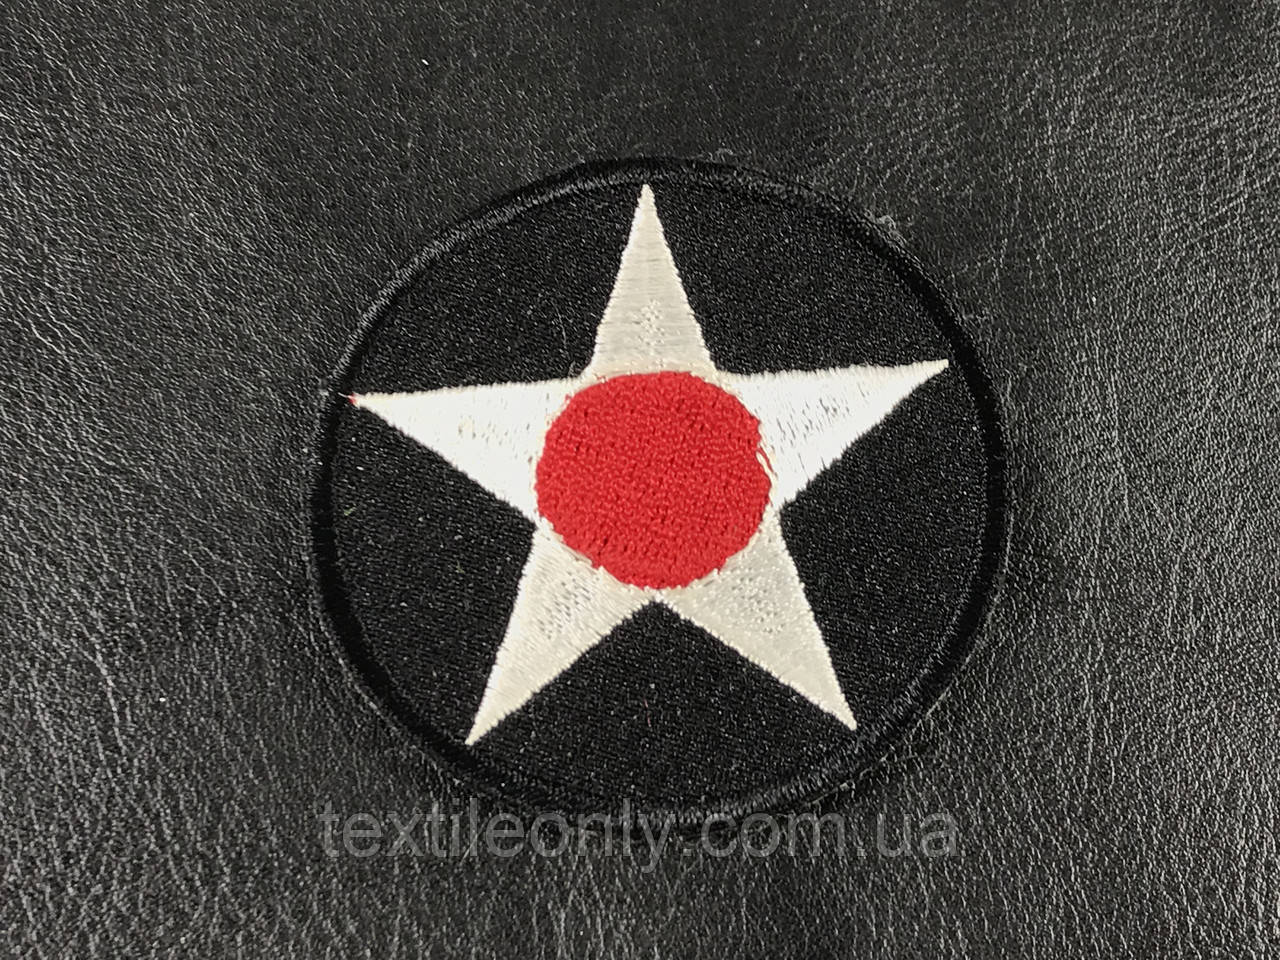 Нашивка Звезда (star) 60 мм